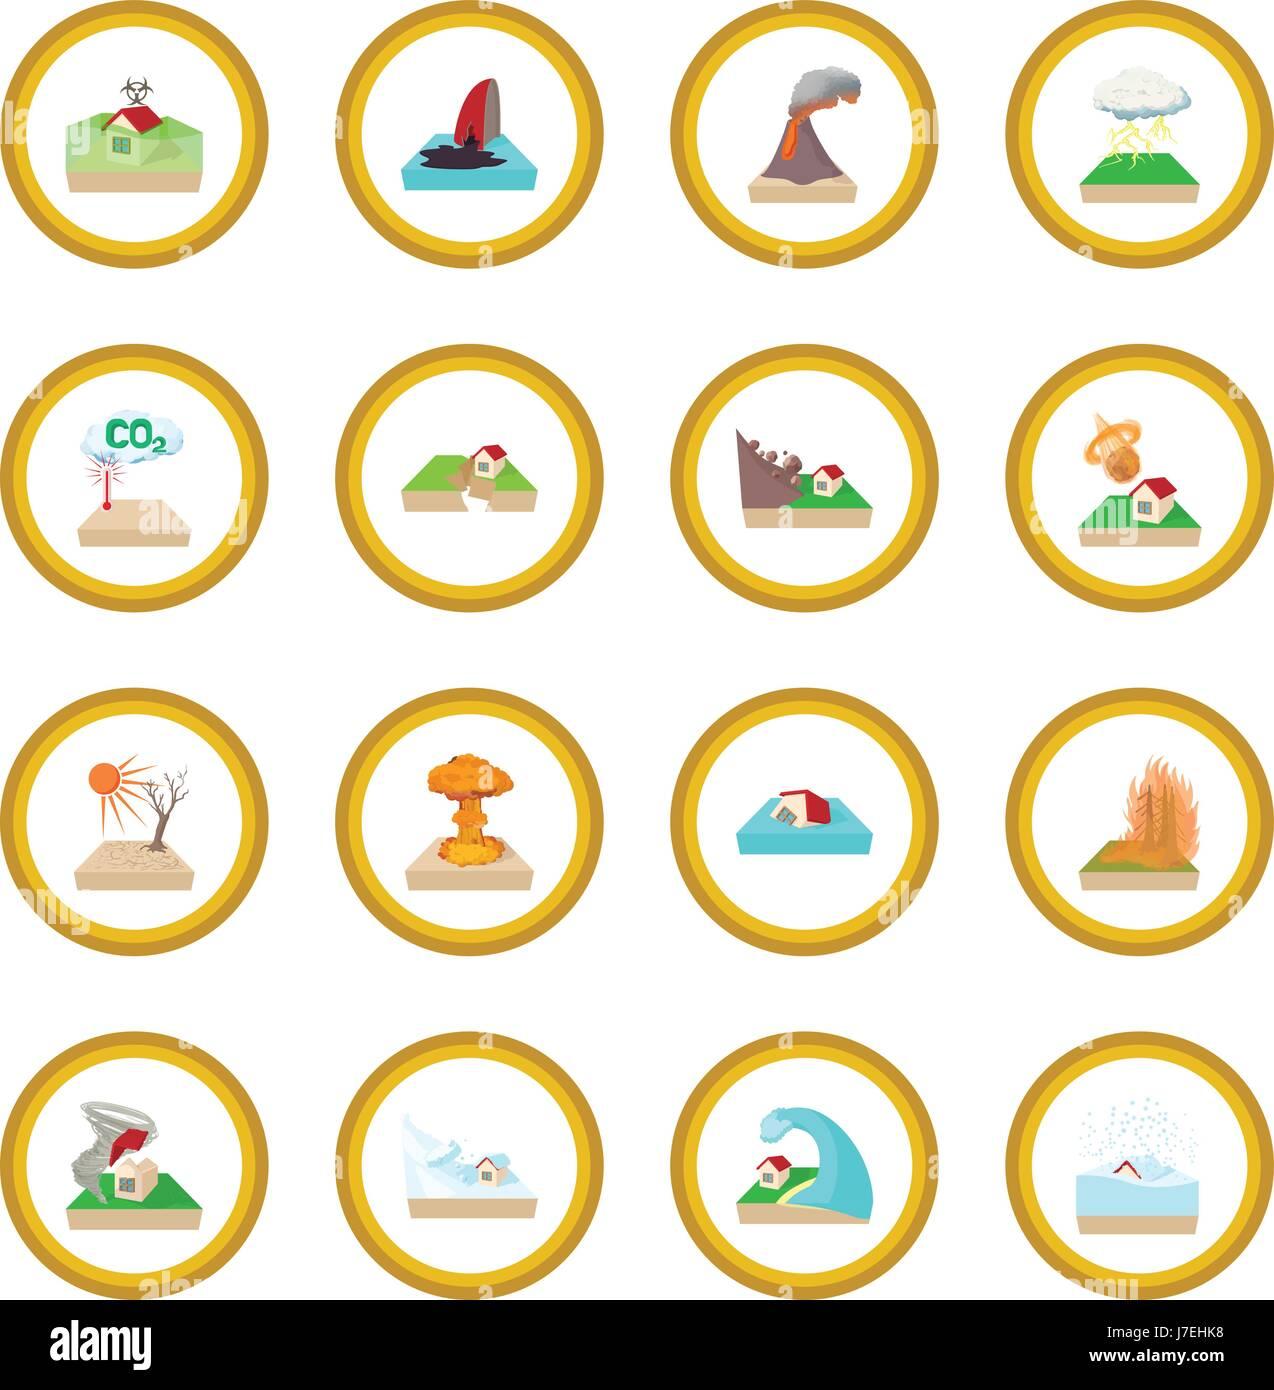 Natural disaster icon circle - Stock Image